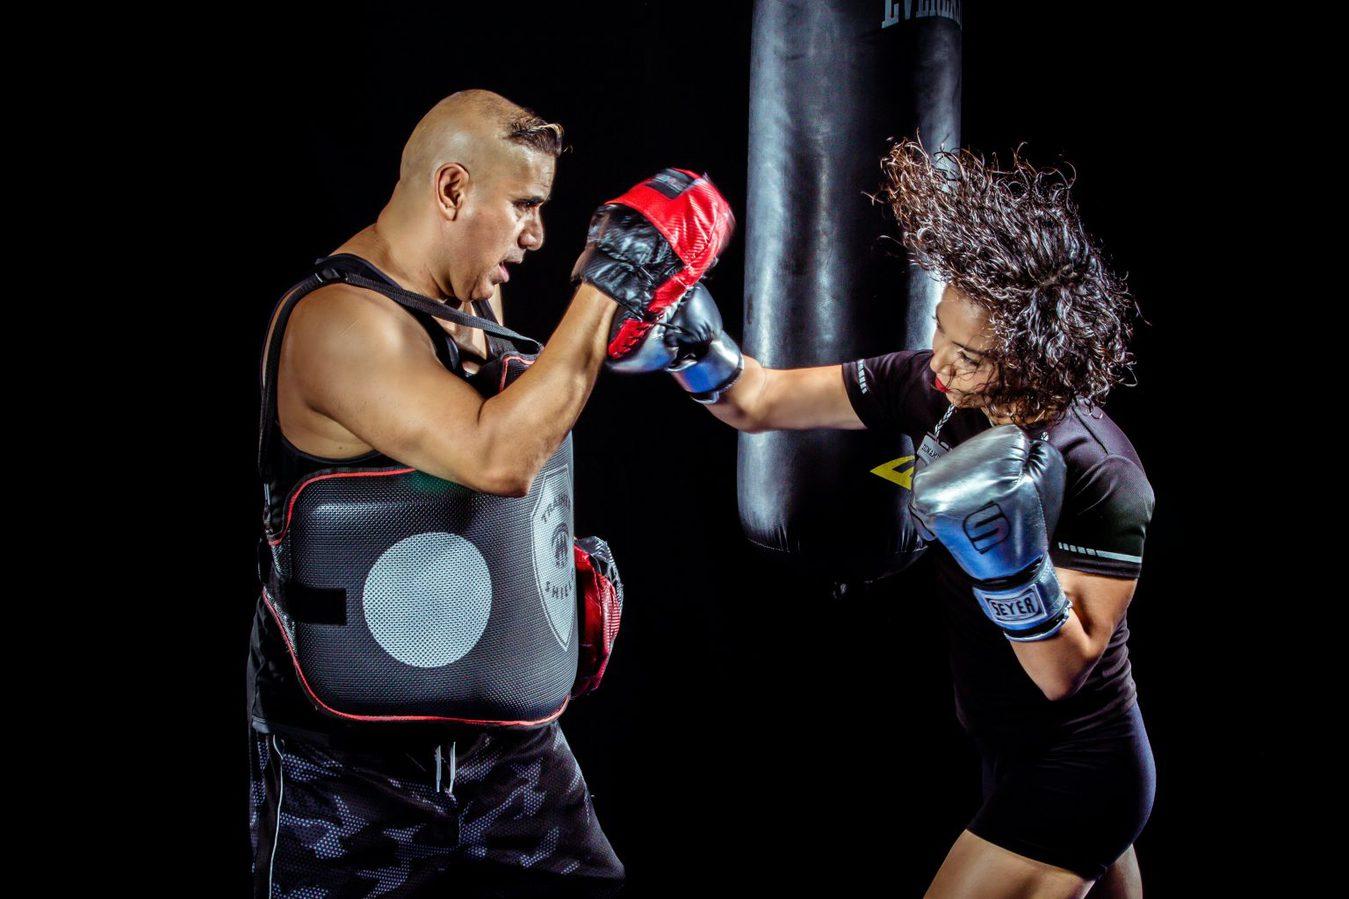 man and woman practising boxing